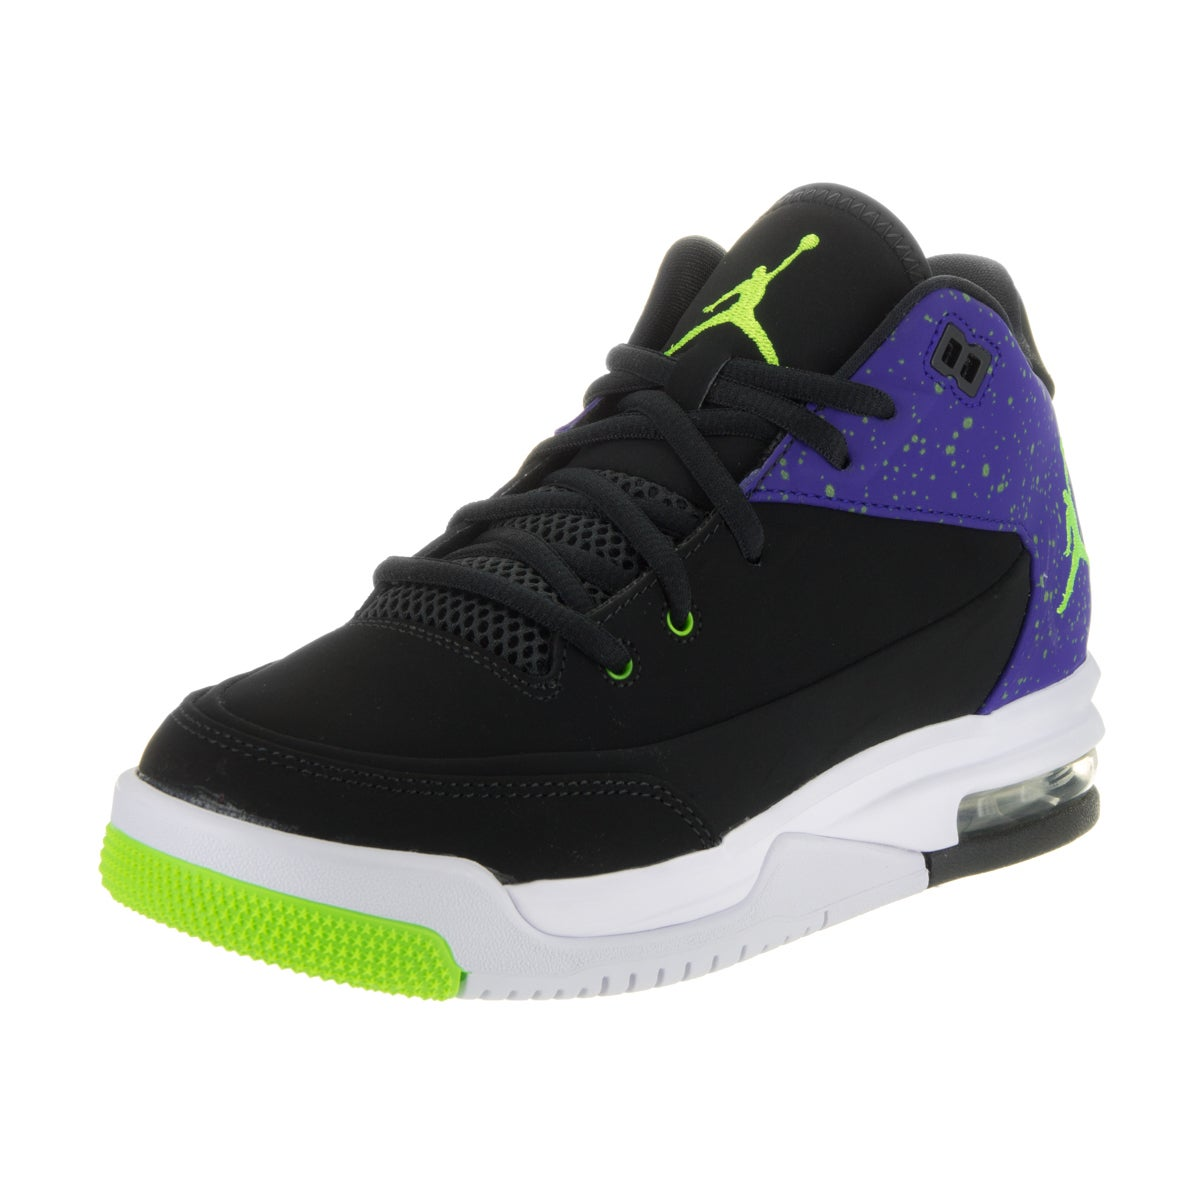 Nike Kids' Jordan Flight Origin 3 Black Nubuck Basketball...